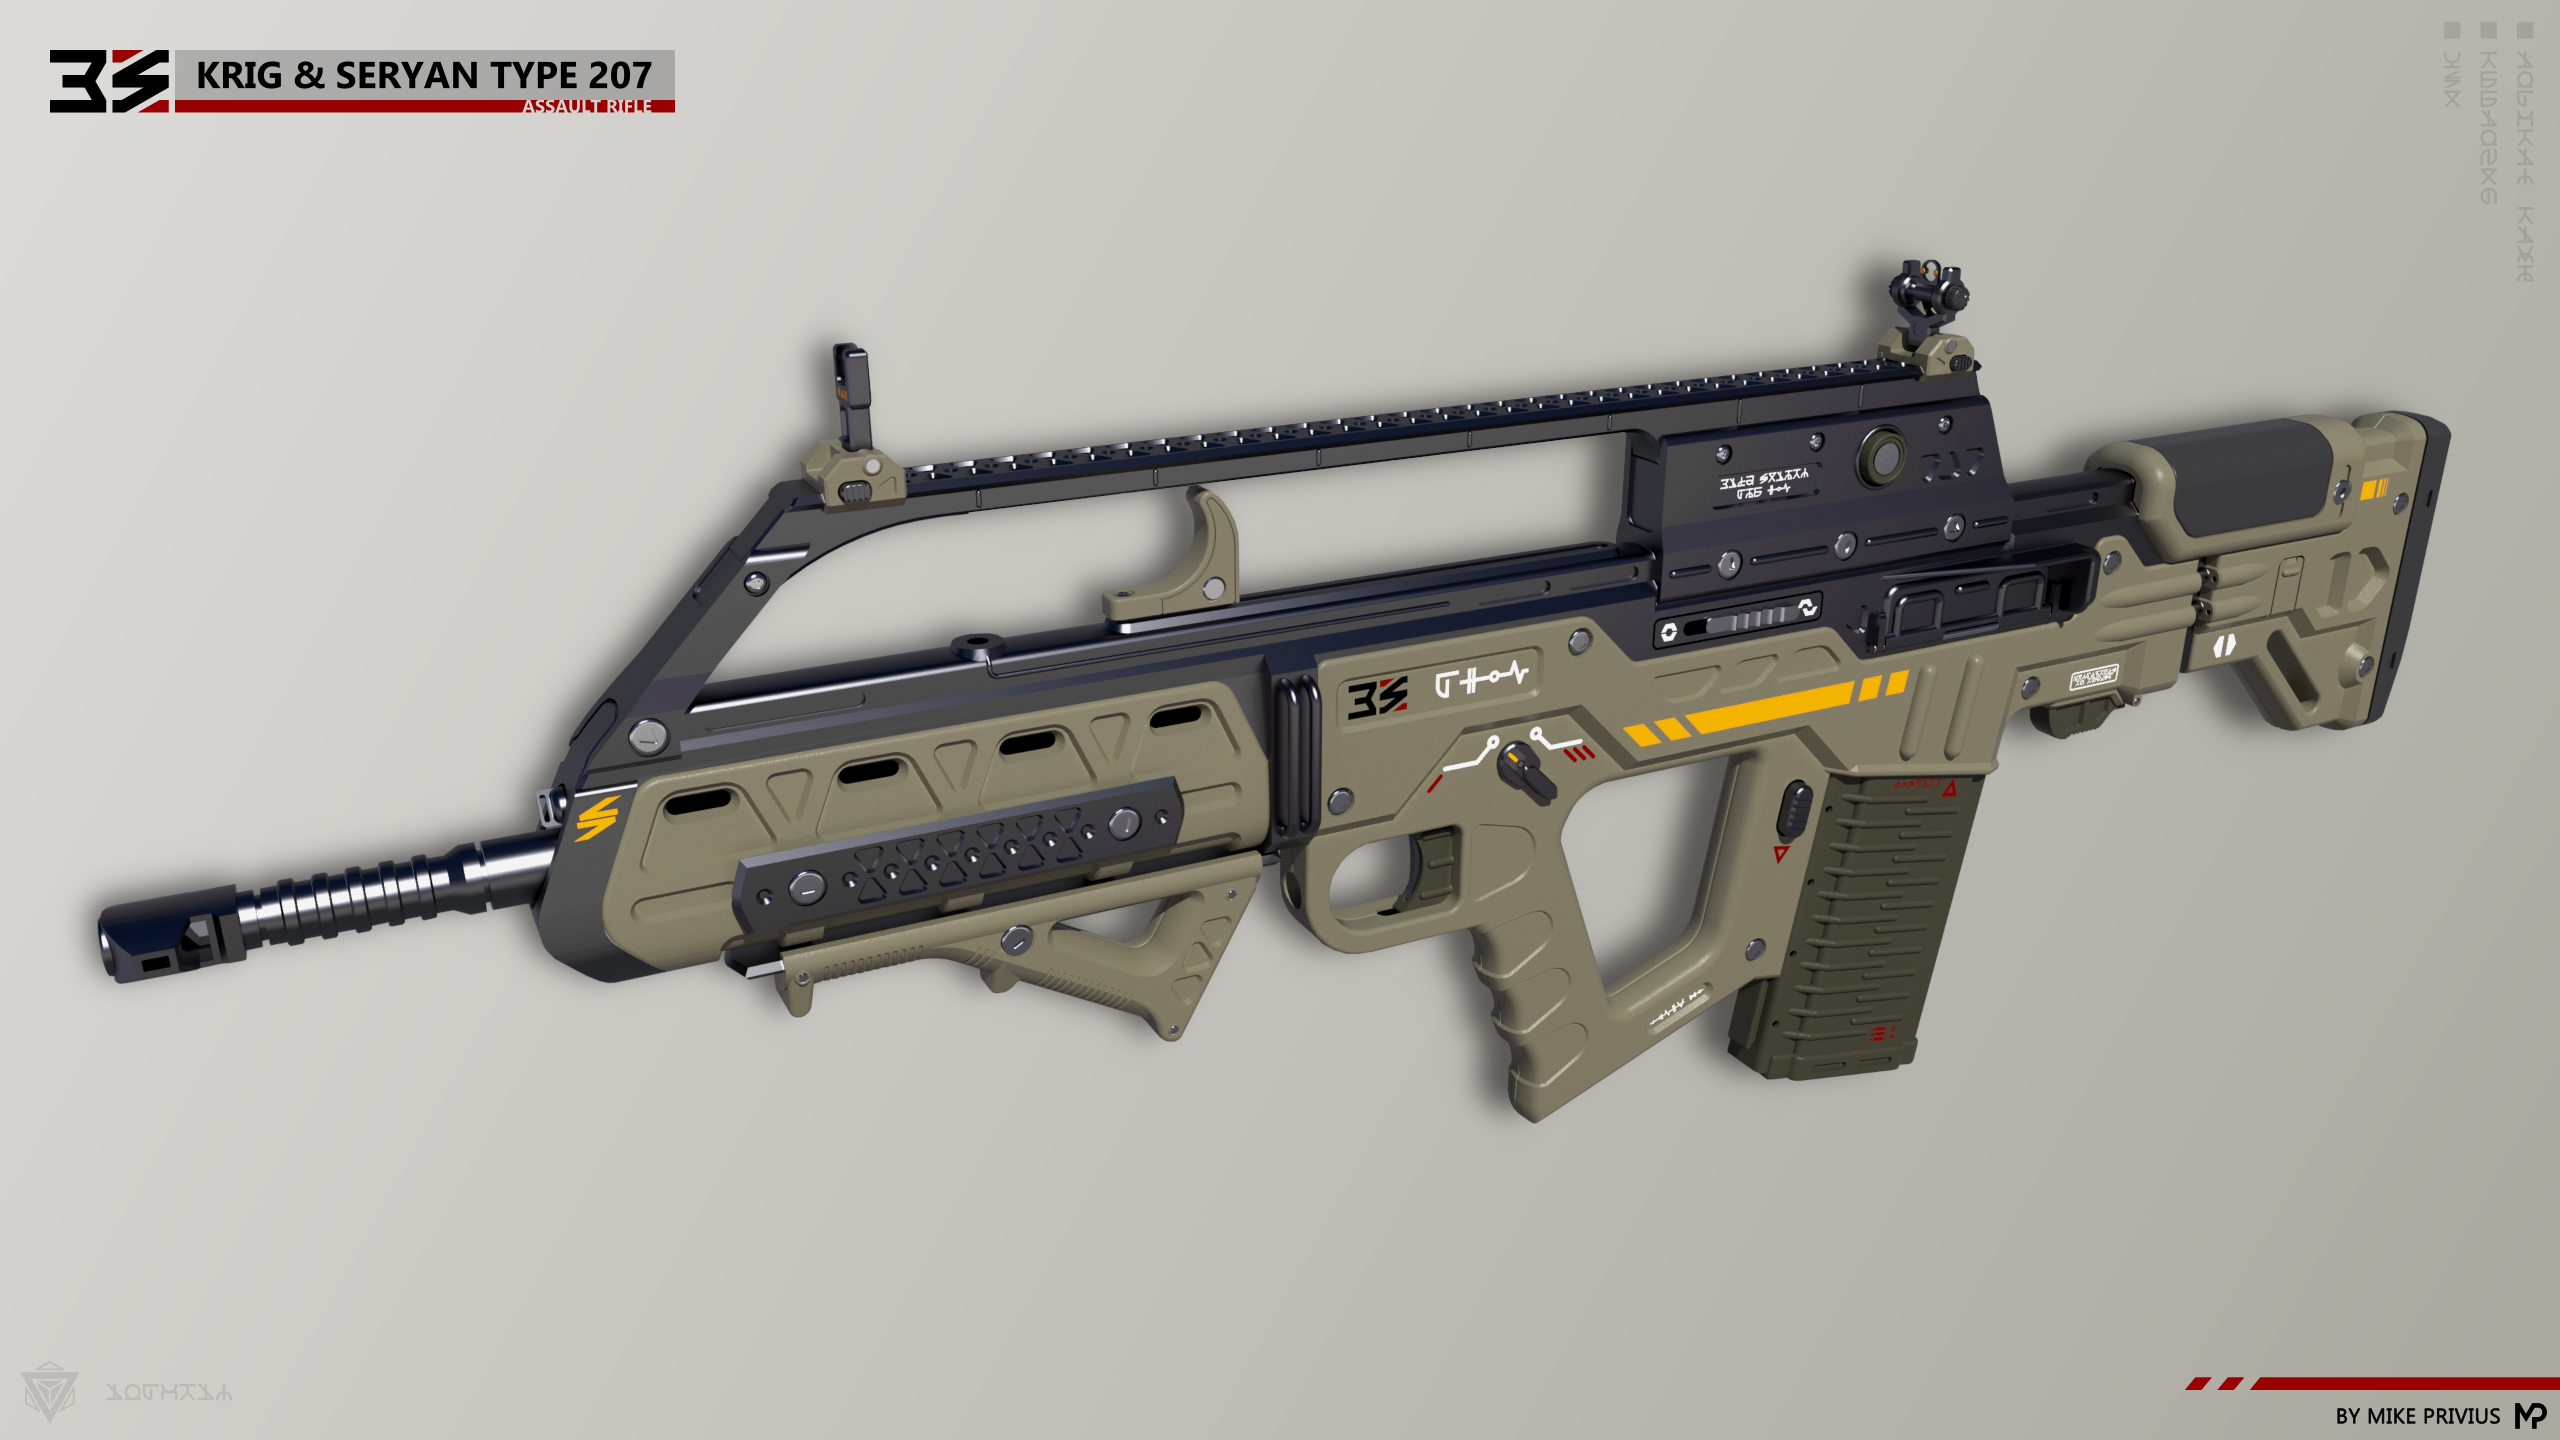 [SketchUp] Krig and Seryan Type 207 Assault Rifle